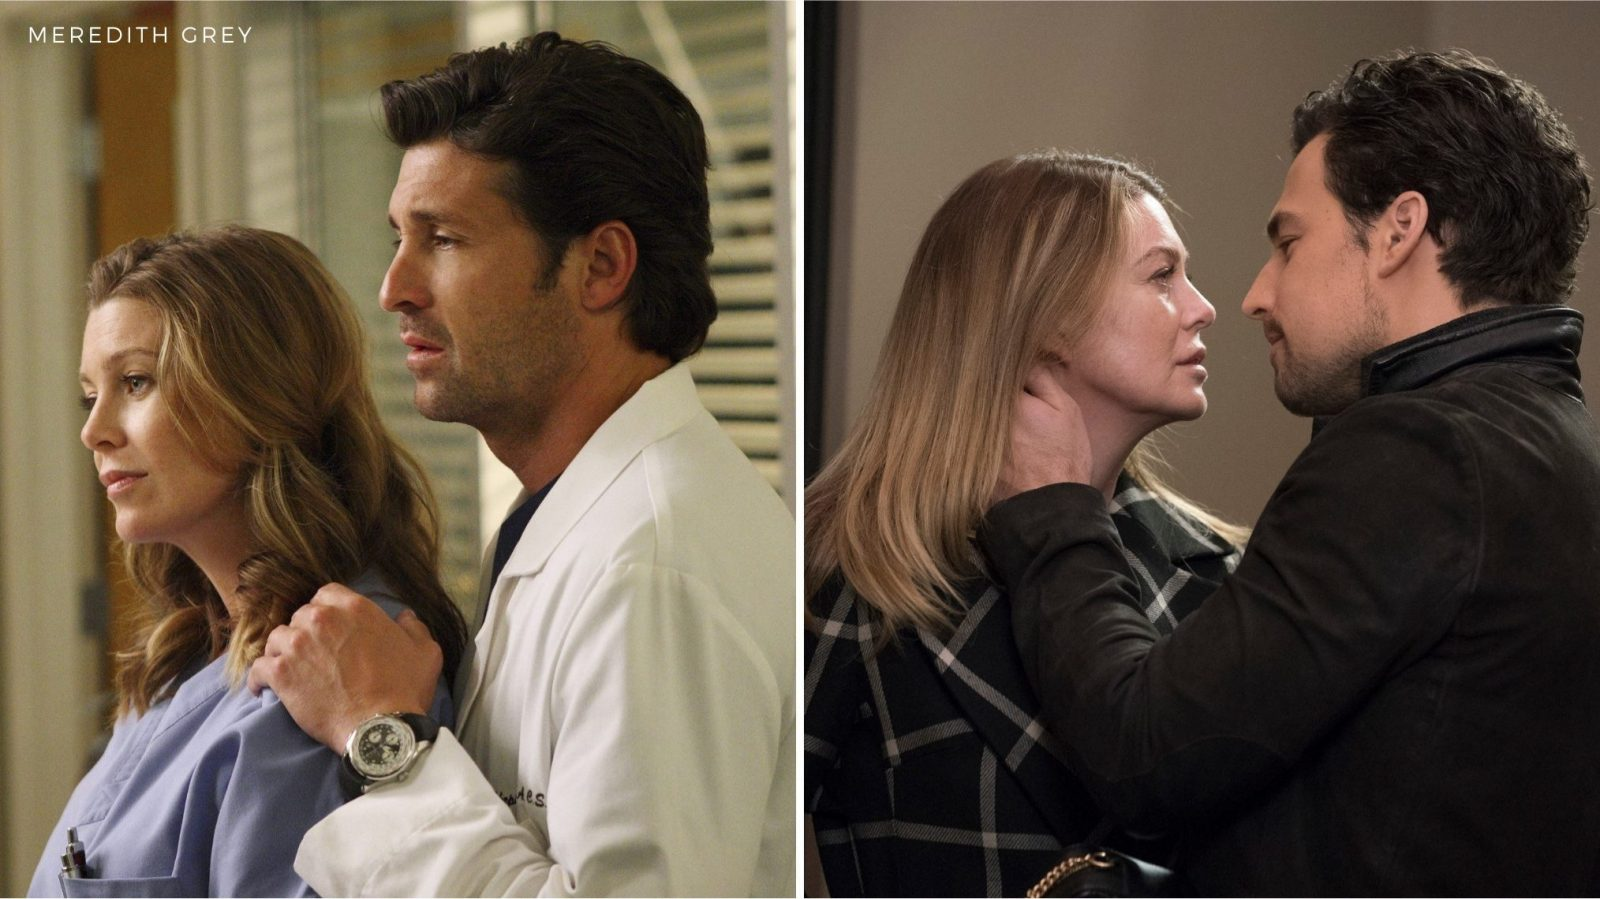 Meredith's Love Interests